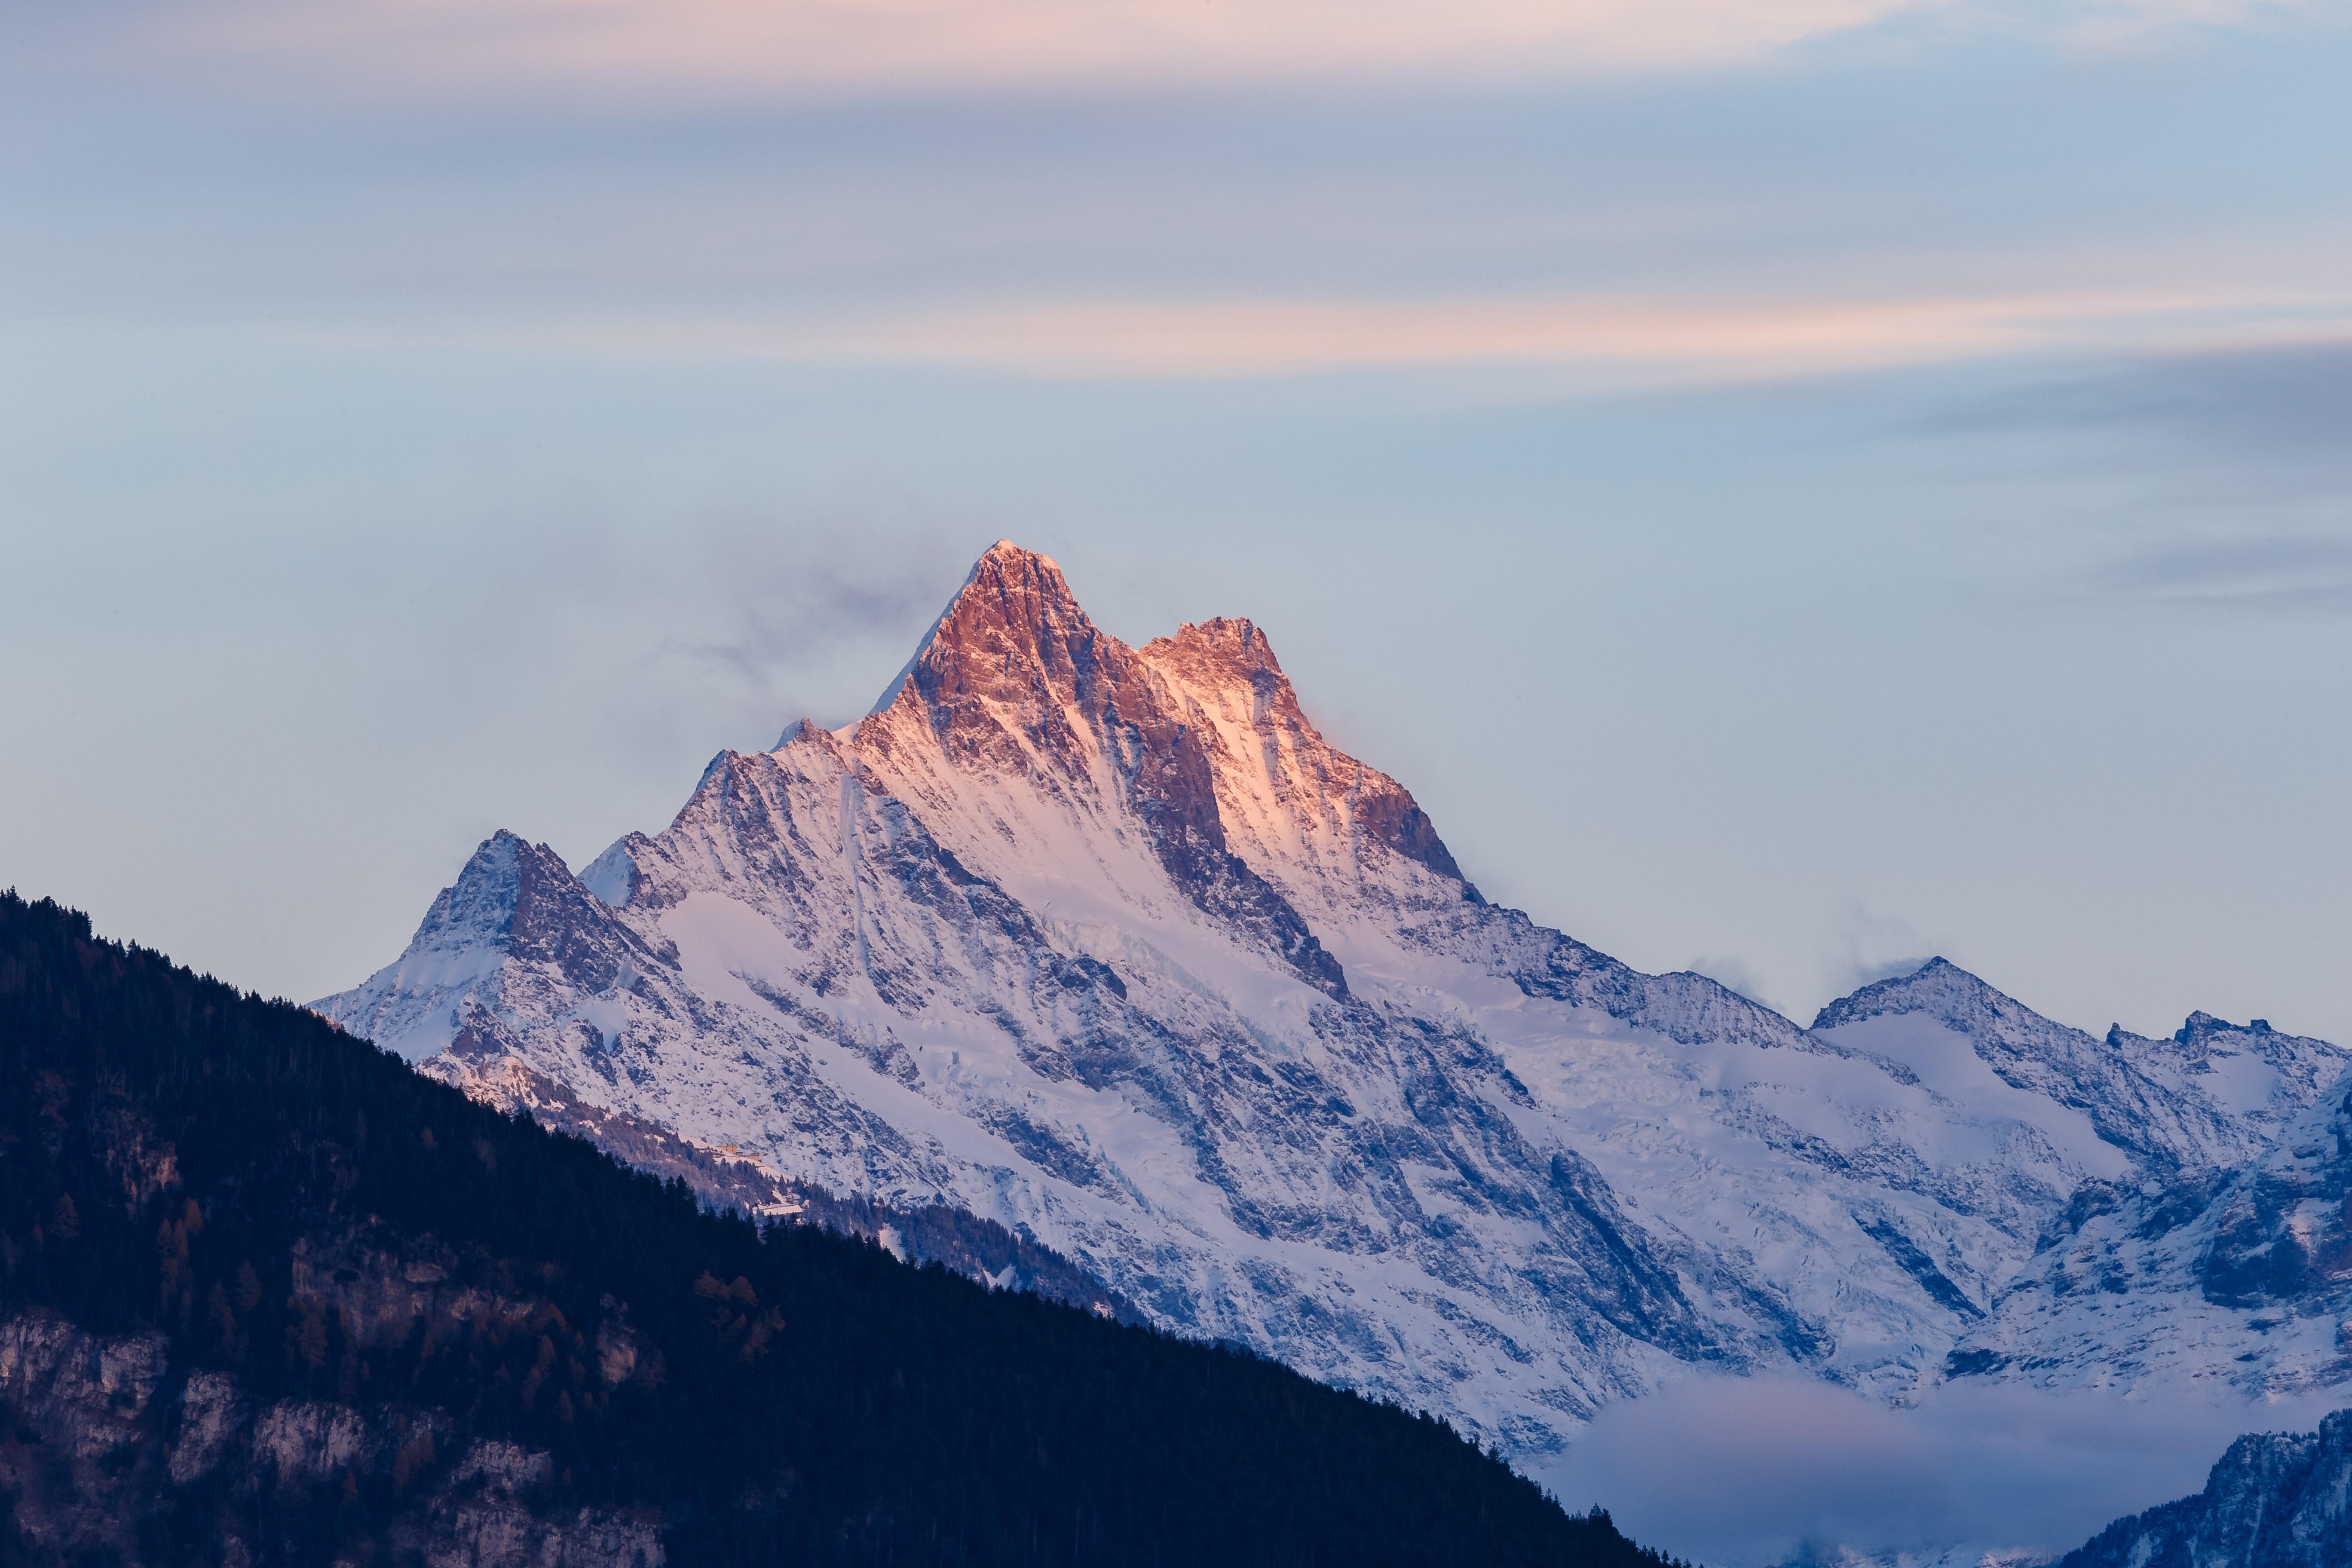 5120x2880 Nature Snow Mountains 4k 5k 5k Hd 4k Wallpapers